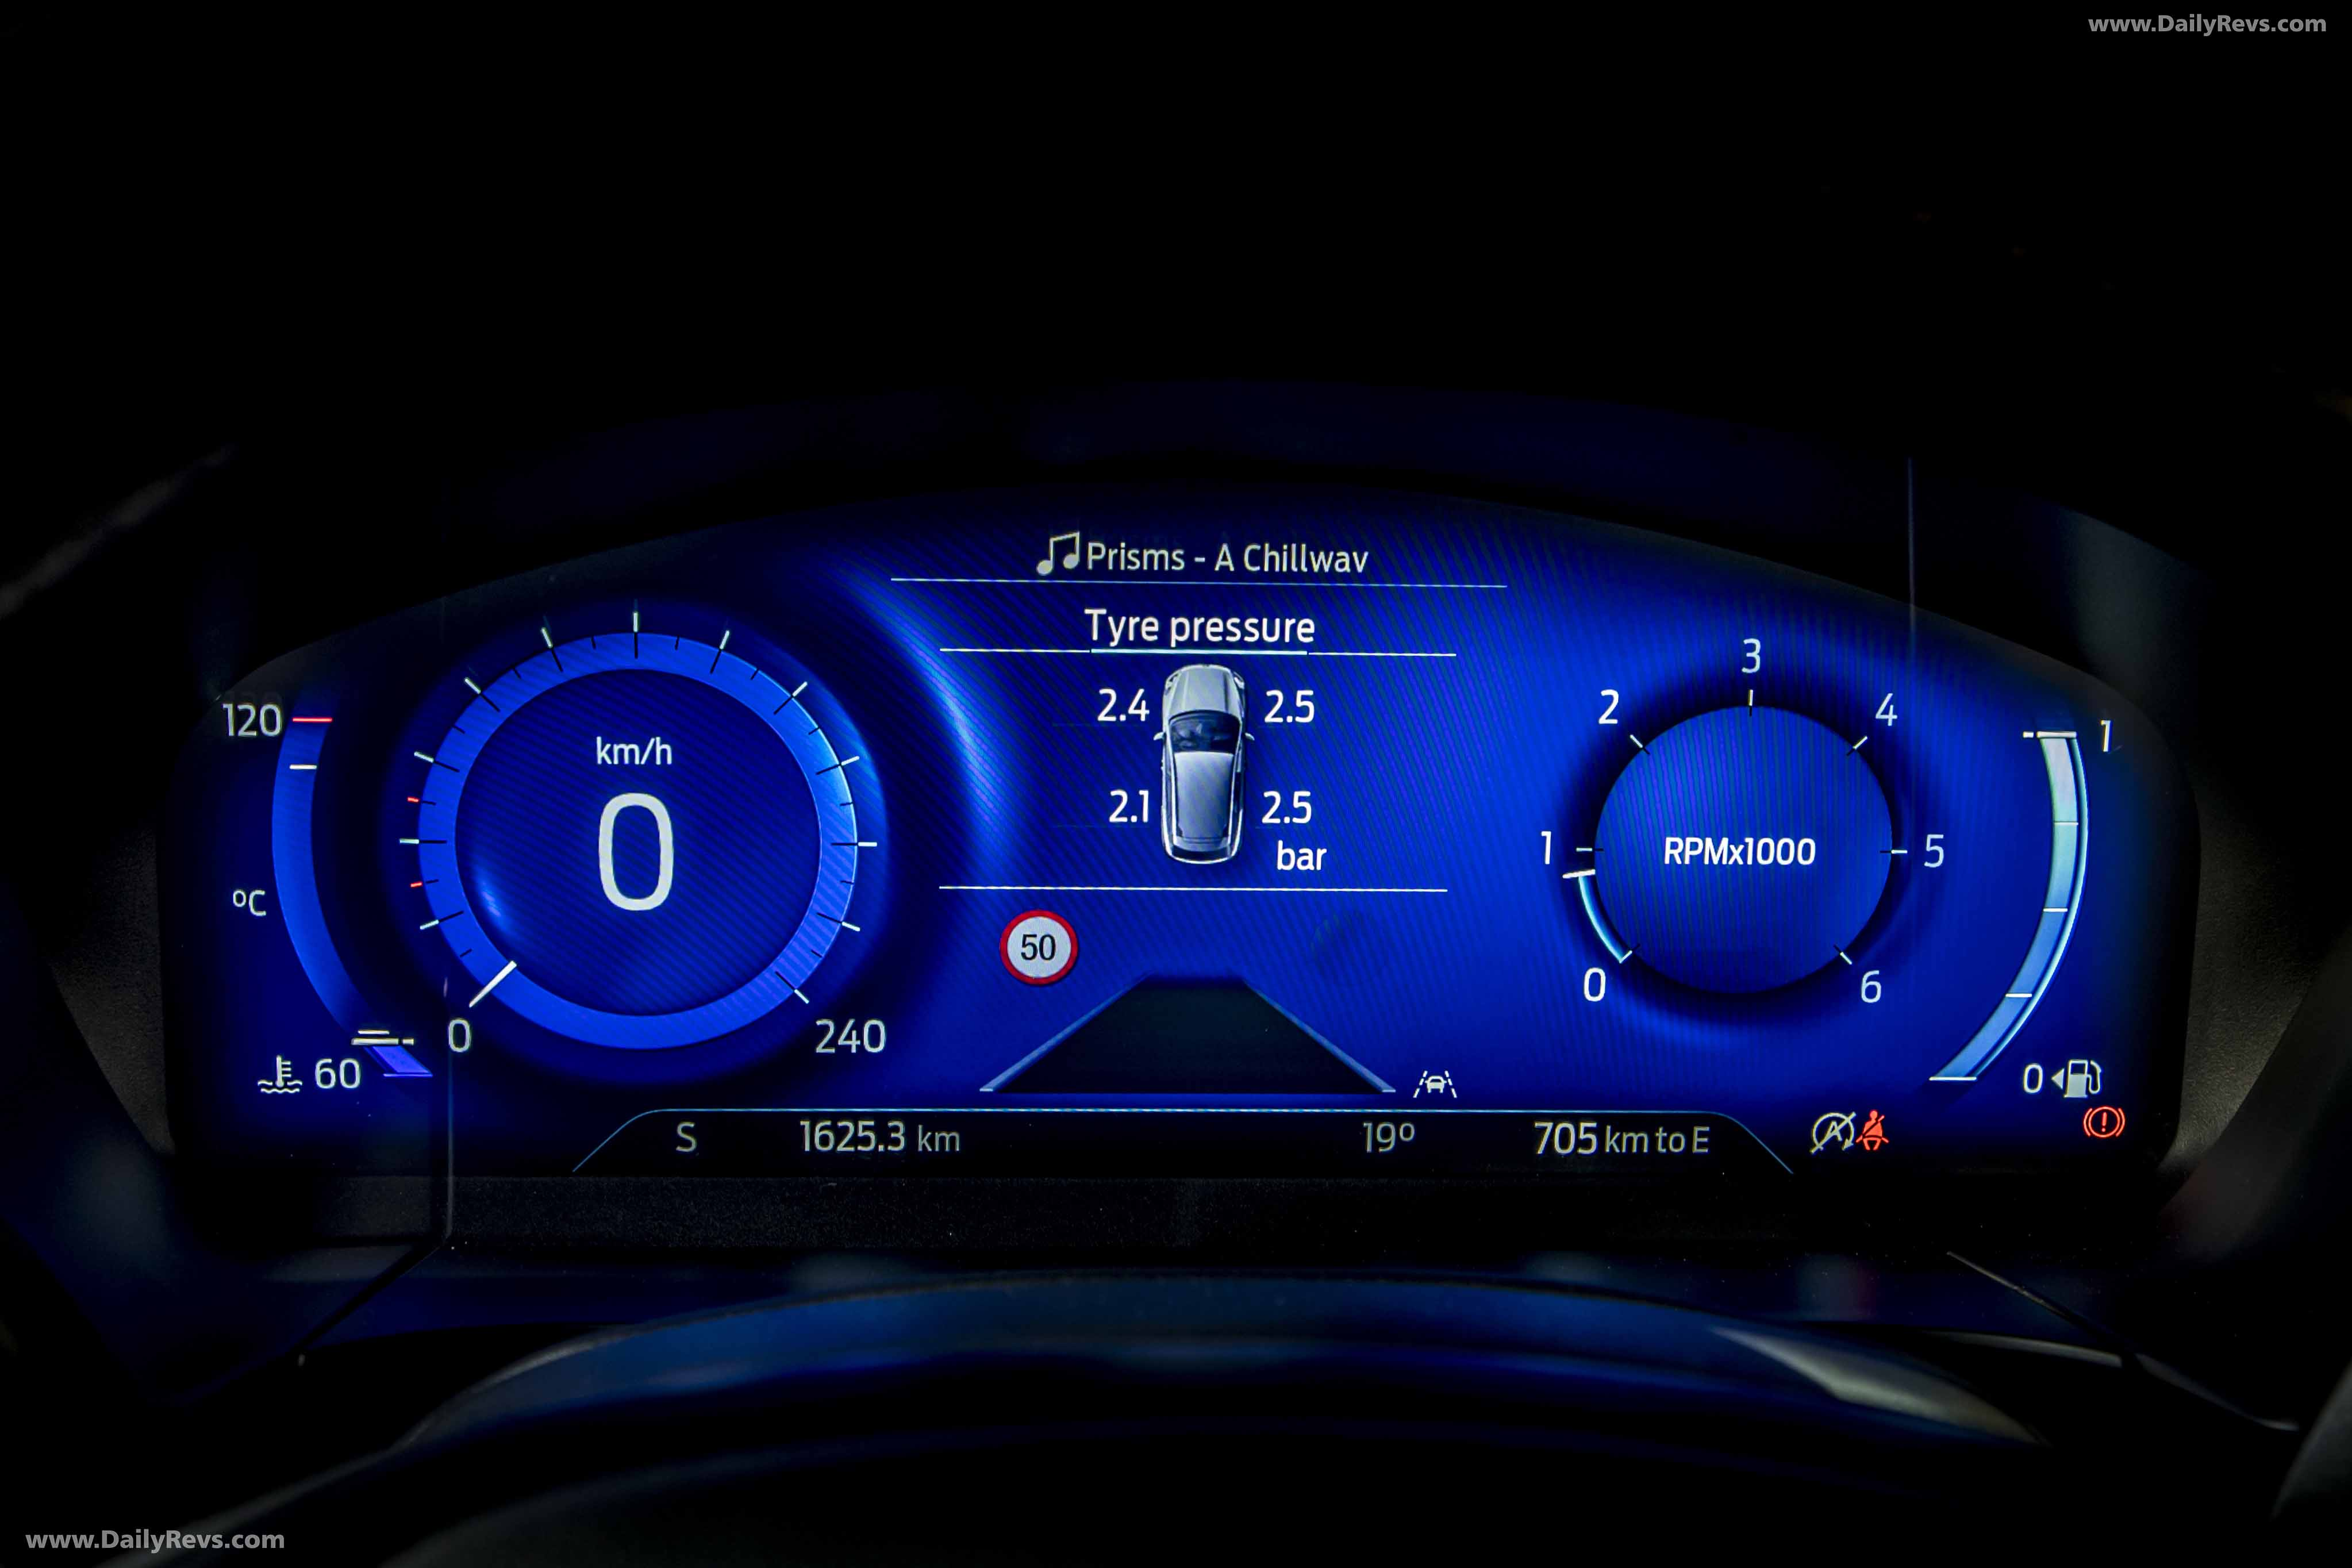 2020 Ford Kuga Vignale Hybrid Hd Pics Videos Specs Info Dailyrevs